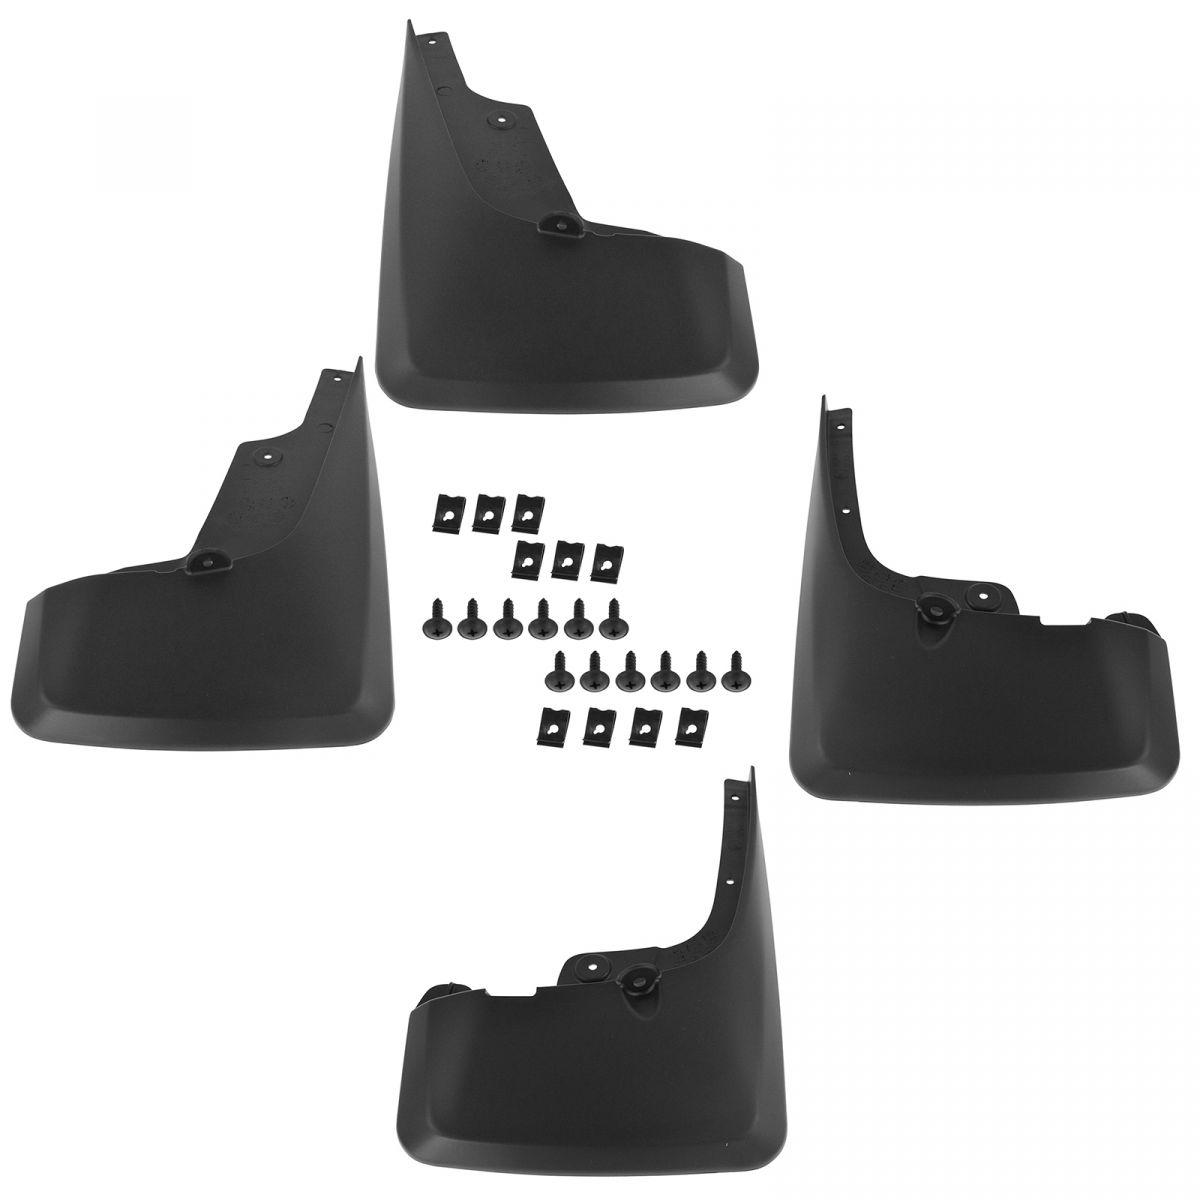 For BMW E60 528i 535i 550i 08-2010 Rear Bumper Tow Hook Cover Cap OE:51127178183